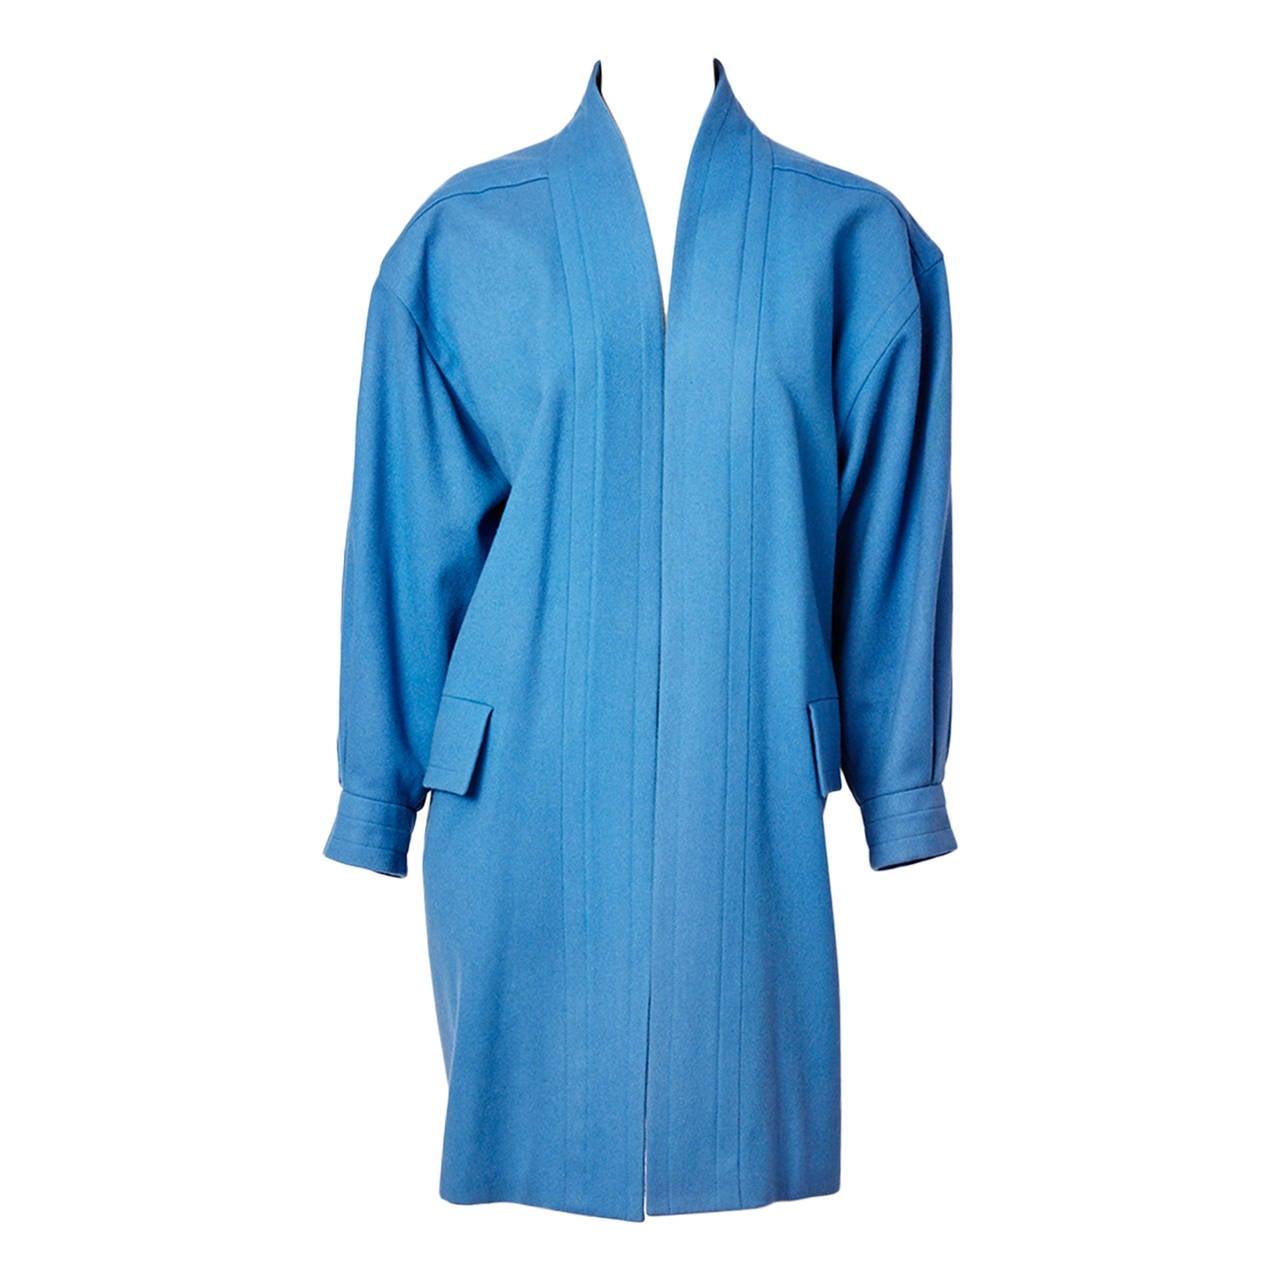 Yves Saint Laurent French Blue Wool Coat